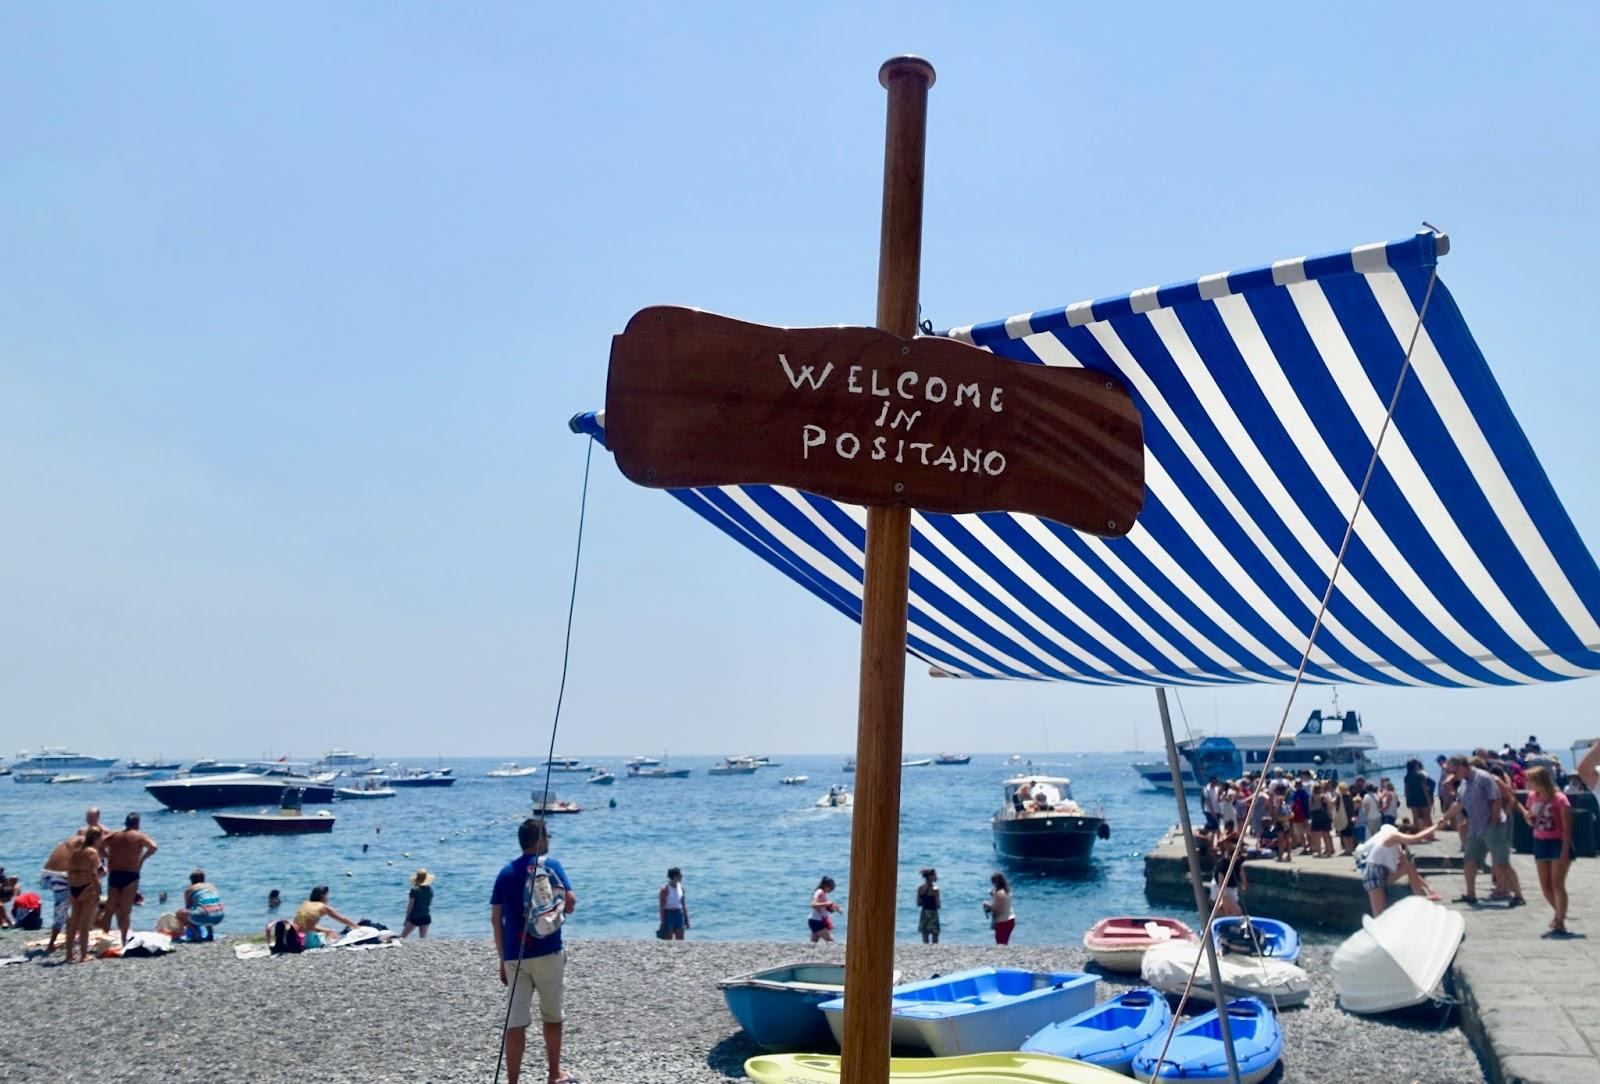 Postitano beach